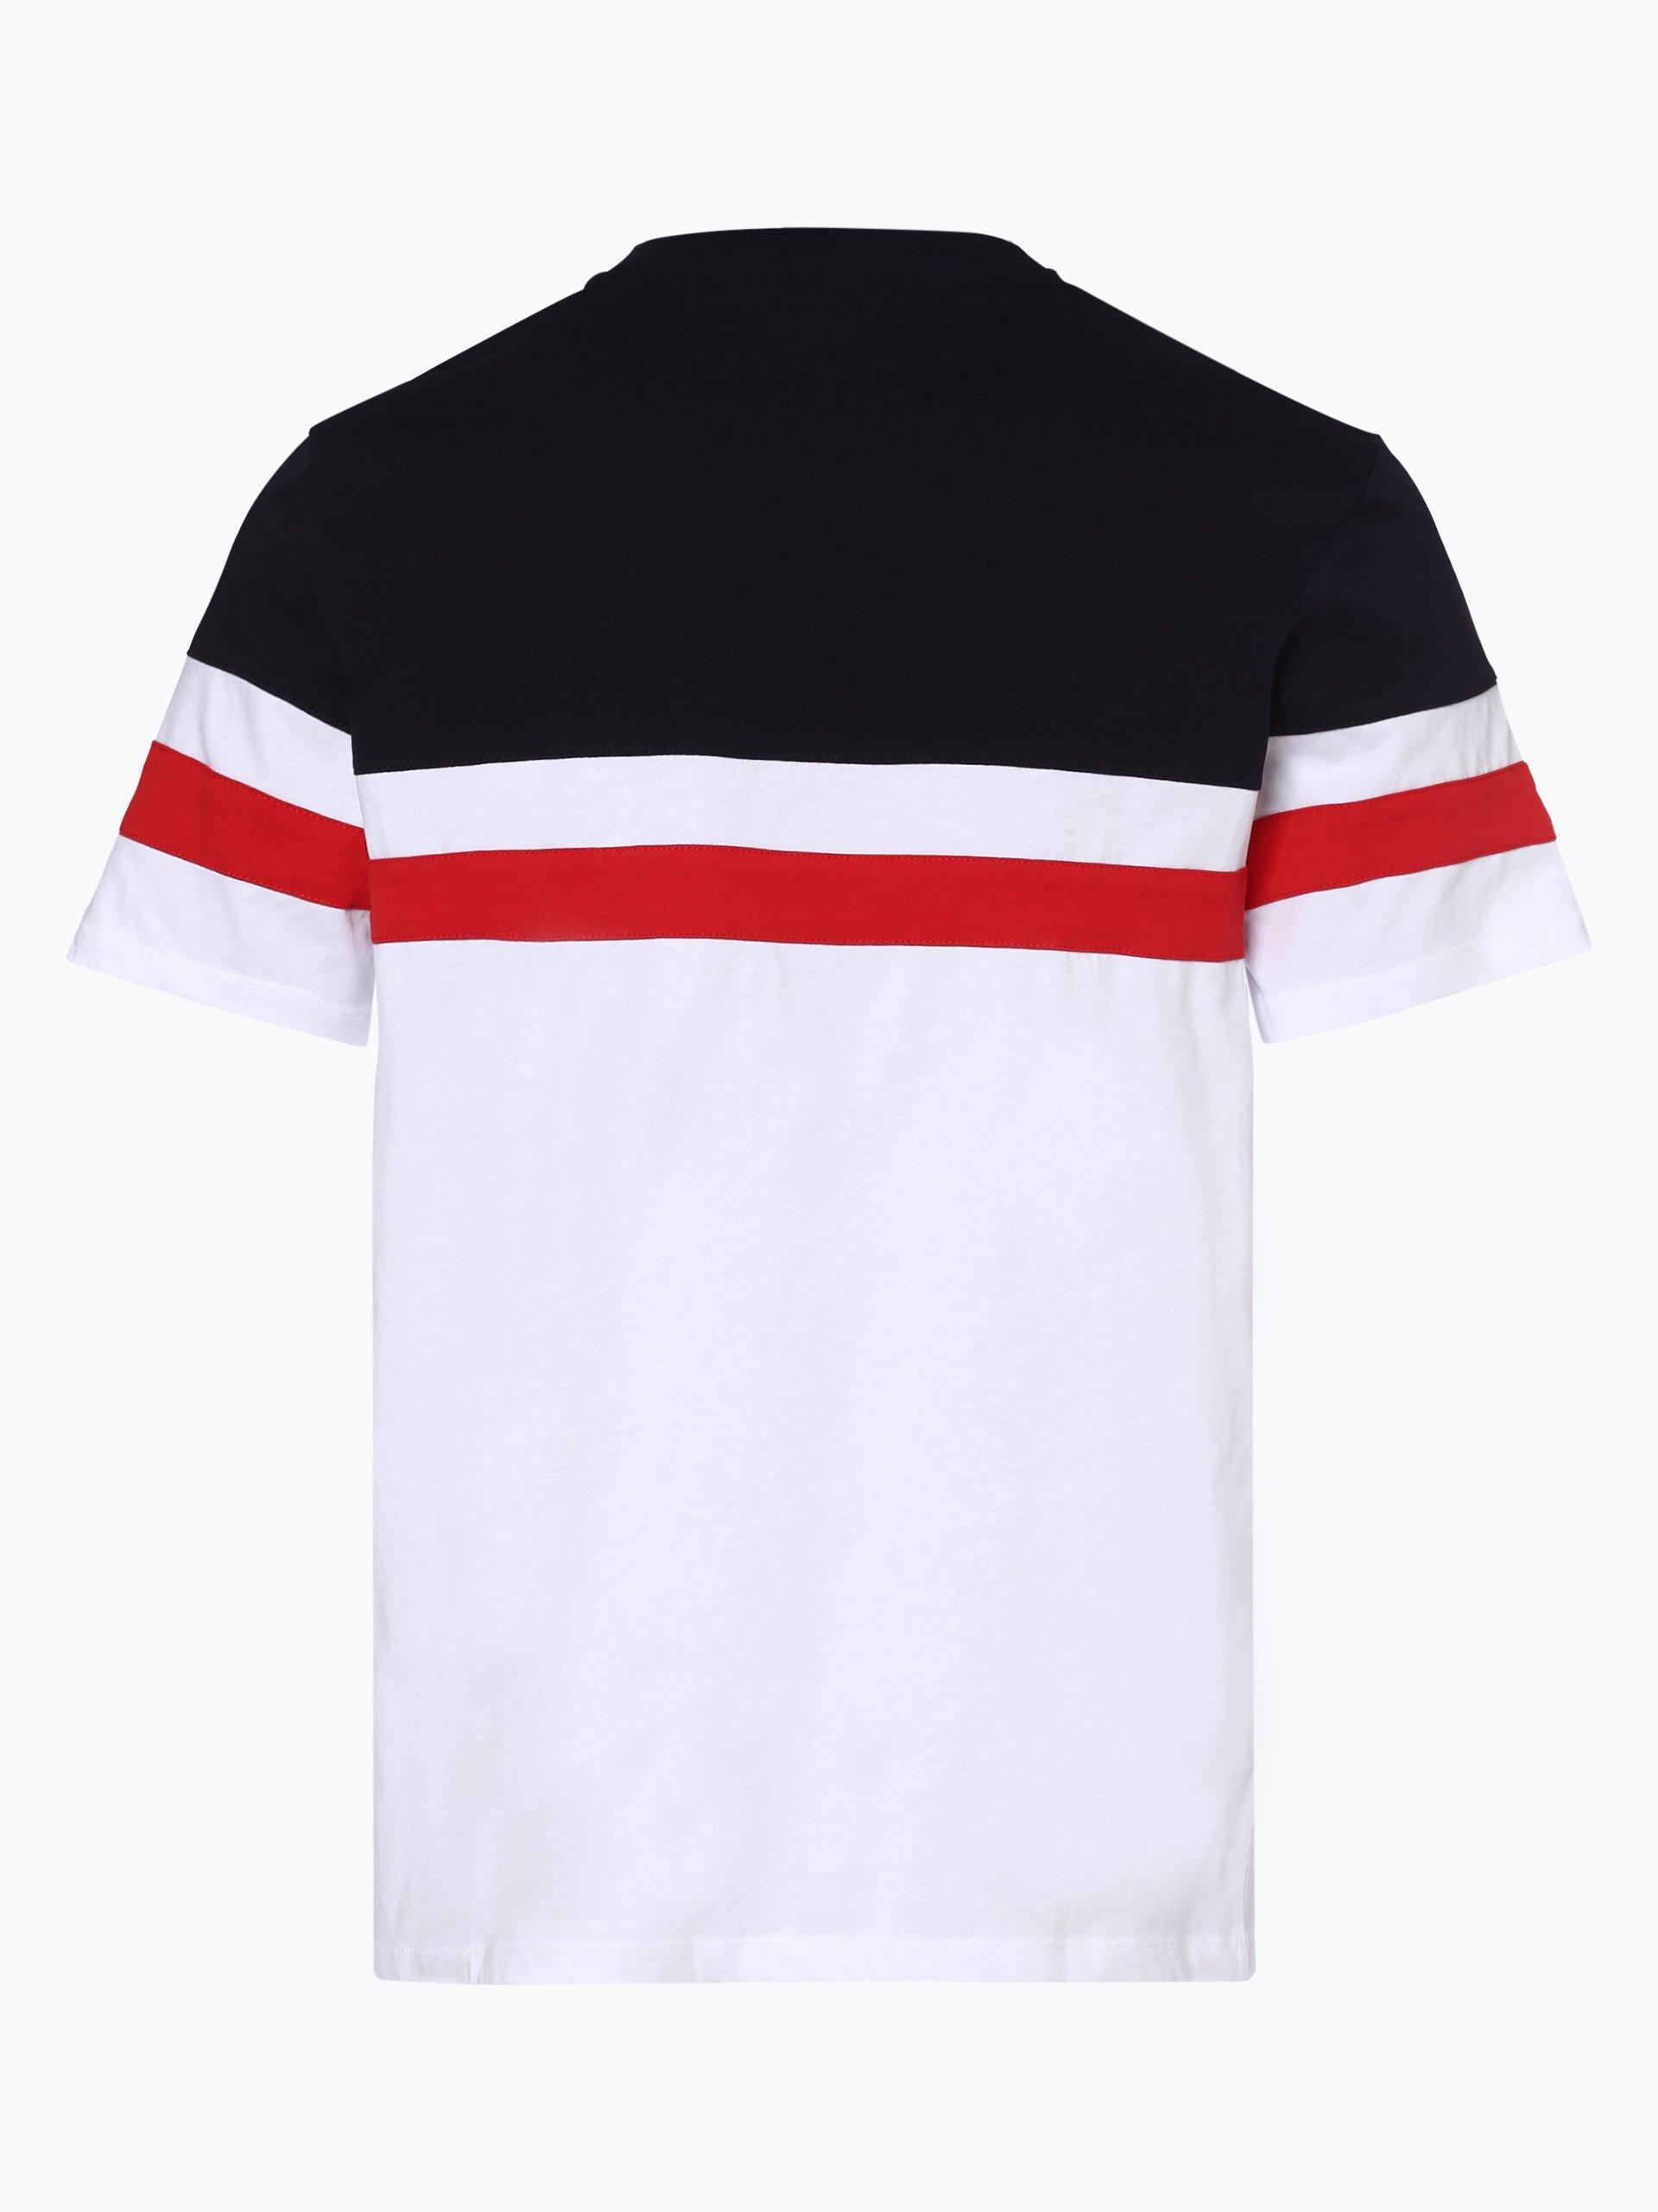 Finshley & Harding London T-shirt męski